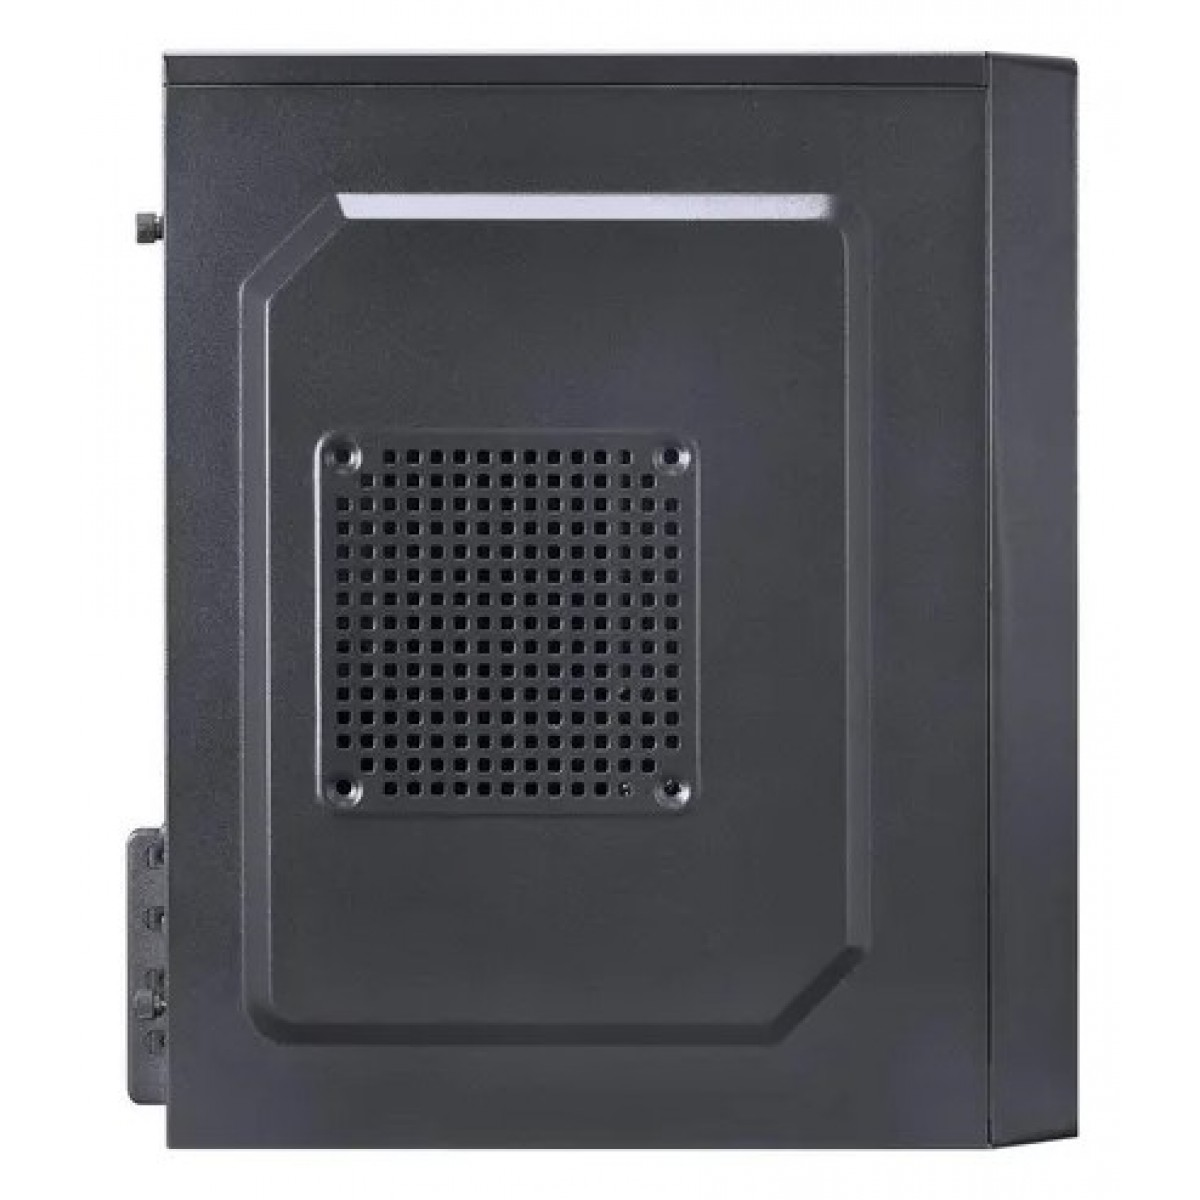 Computador Skul T-Home Business B700 i7 7700 / 8GB DDR4 / SSD 120GB  / HDMI/VGA / FONTE 300W